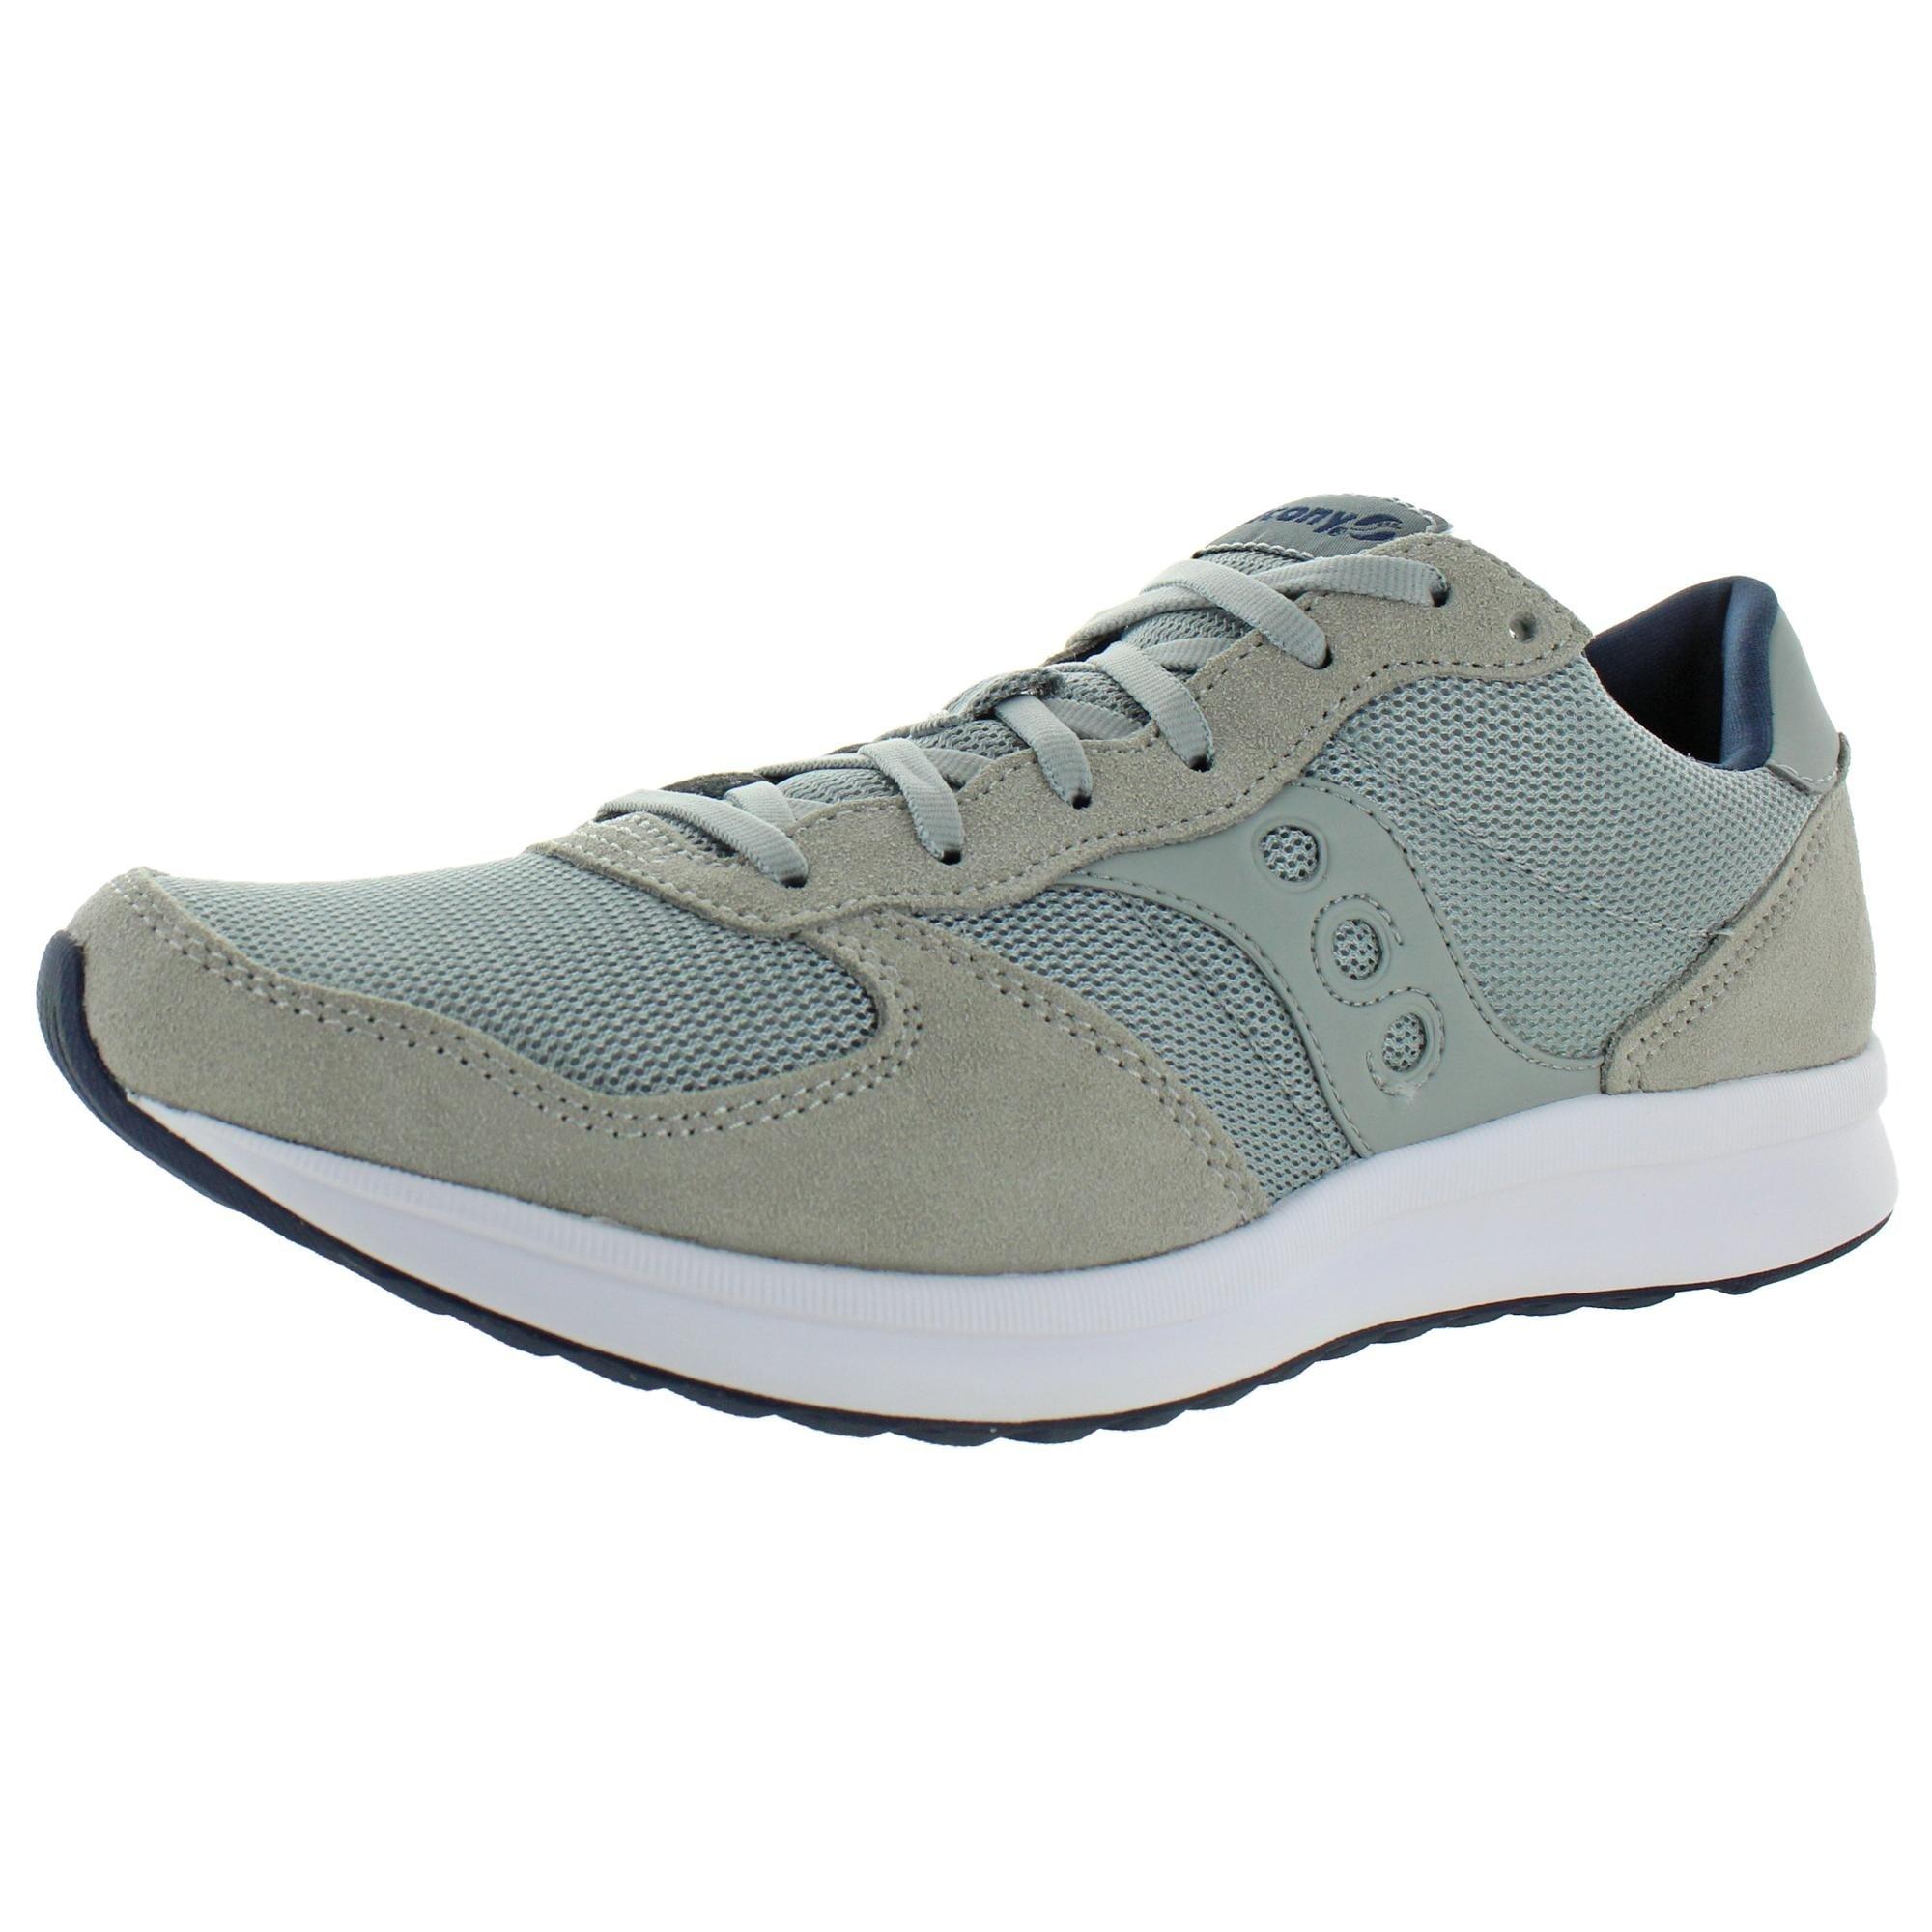 Shop Saucony Mens Getaway Running Shoes